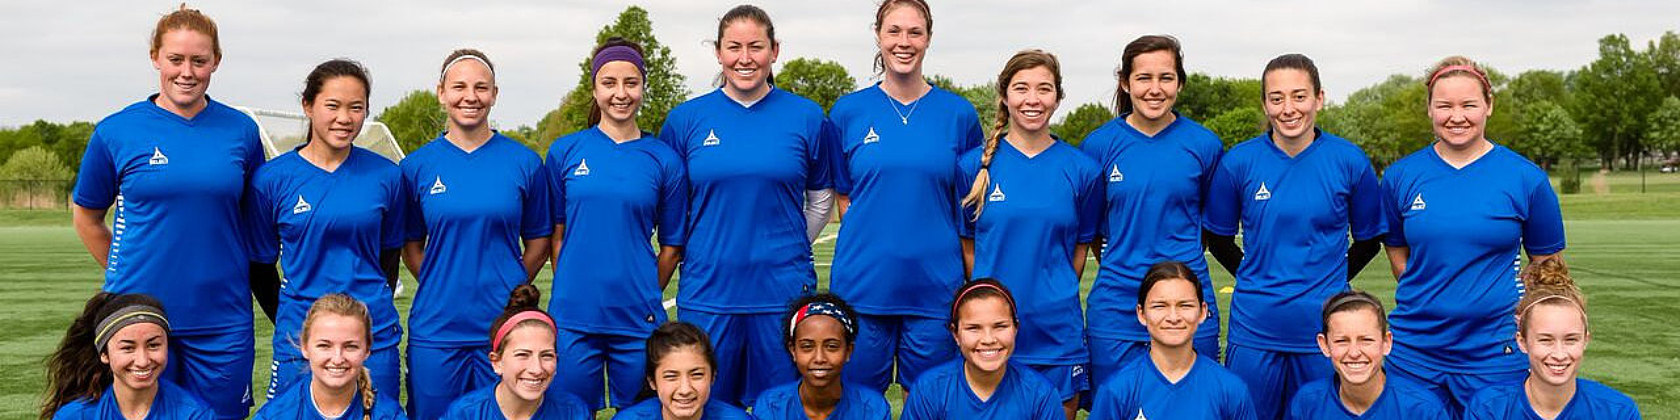 US Deaf Women's National Team squad